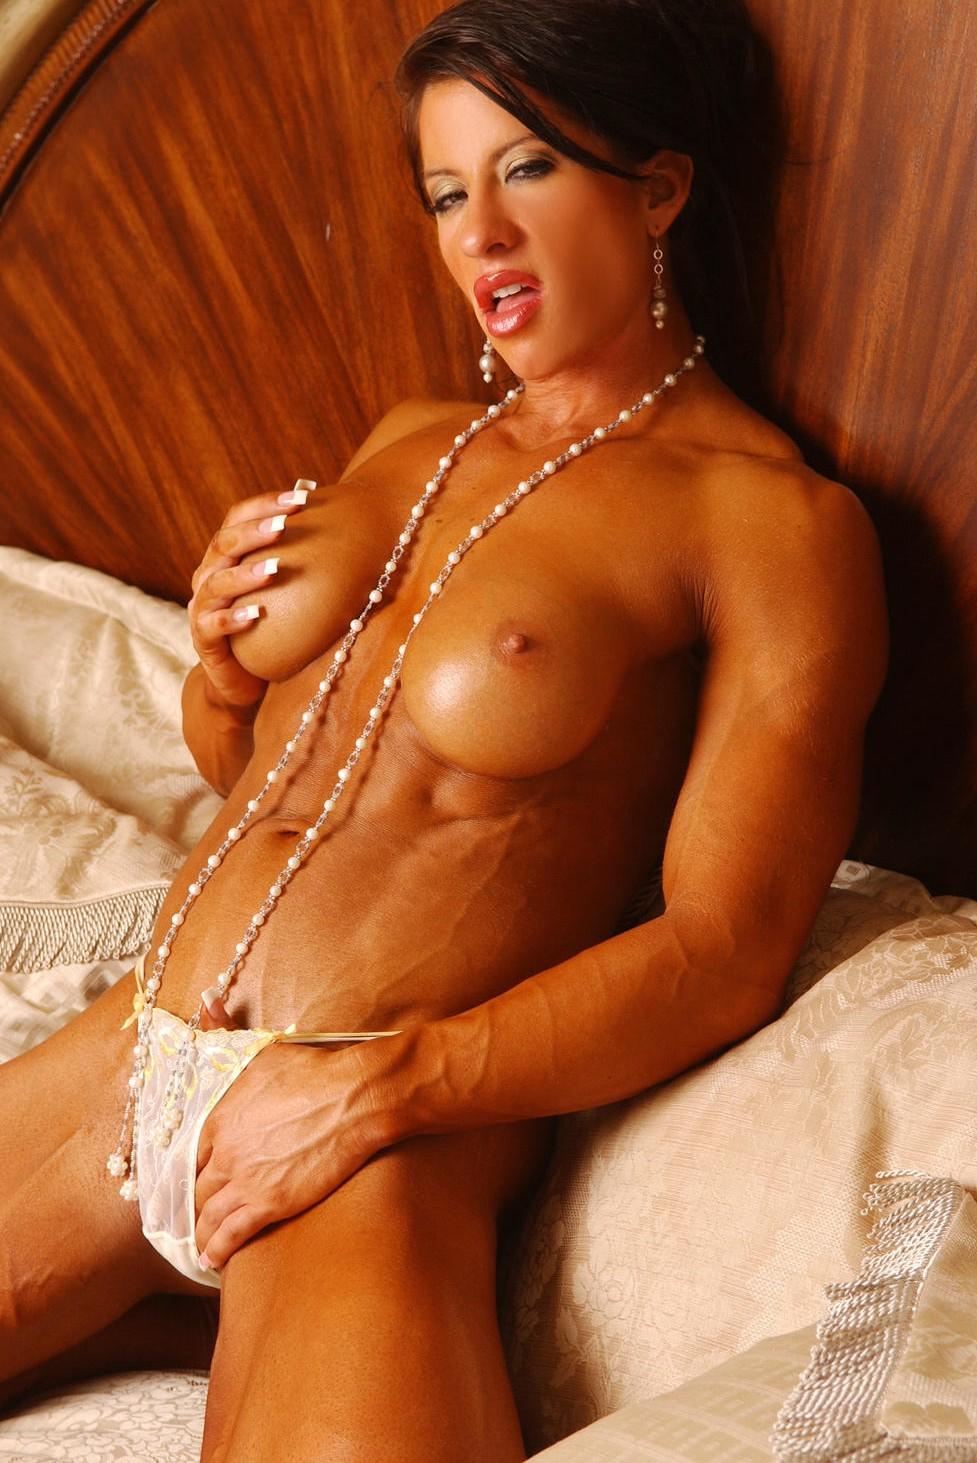 Jessica sierra nude clip